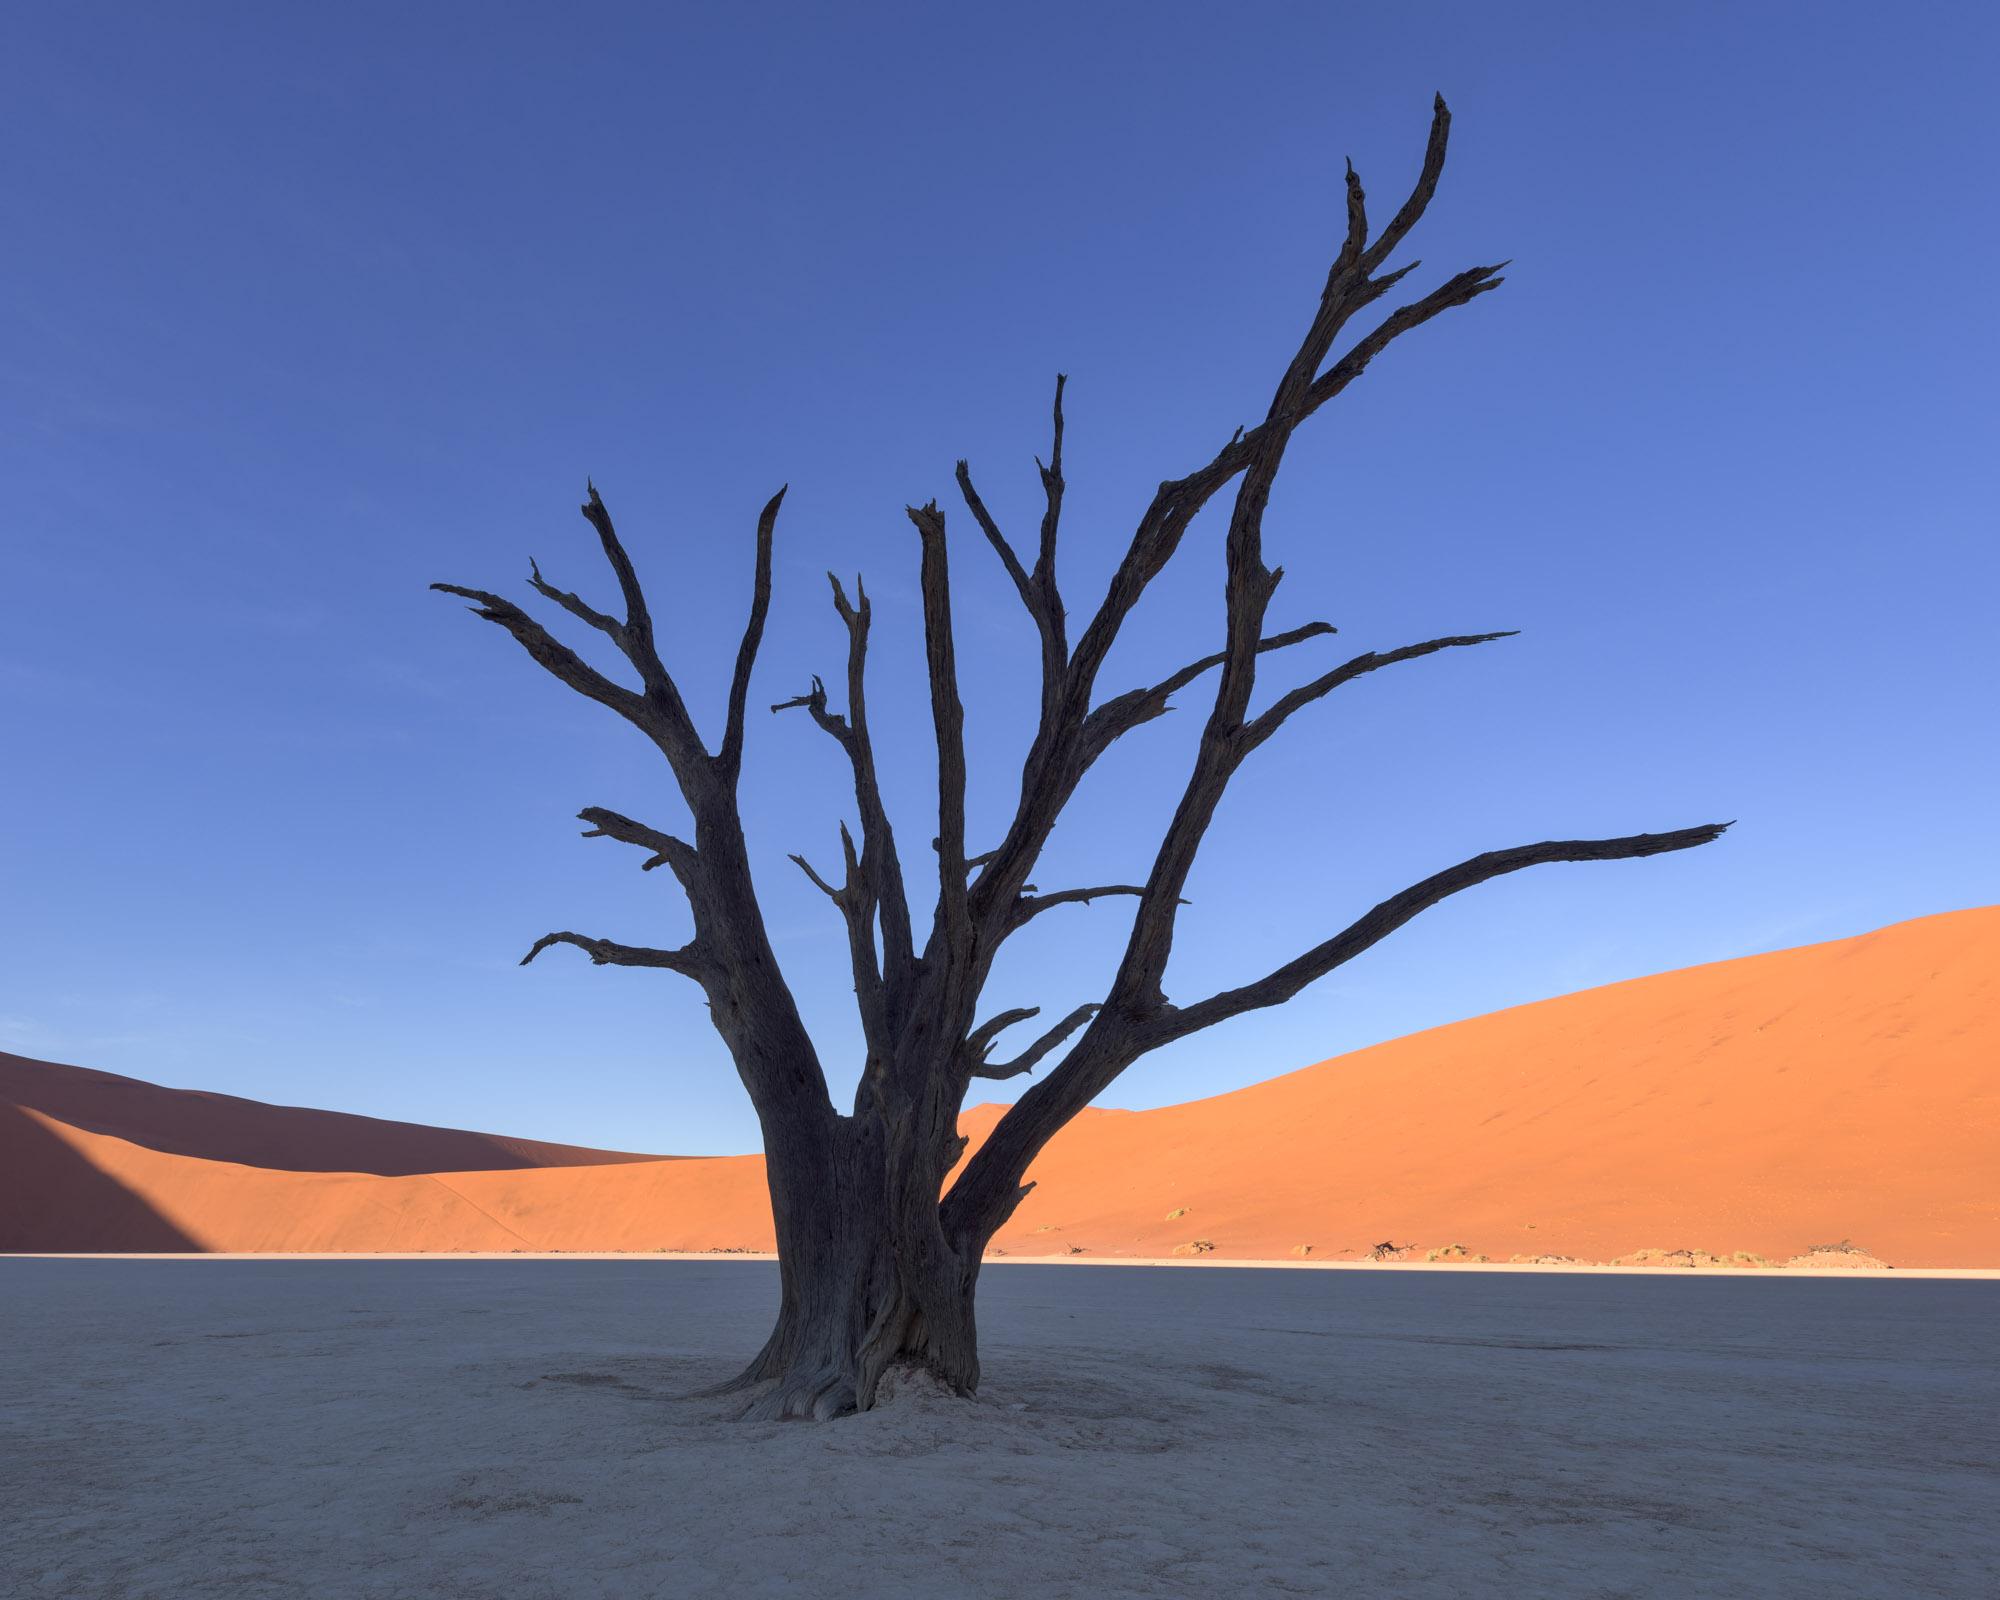 Dead Acacia Trees in Deadvlei, Sossusvlei, Namibia